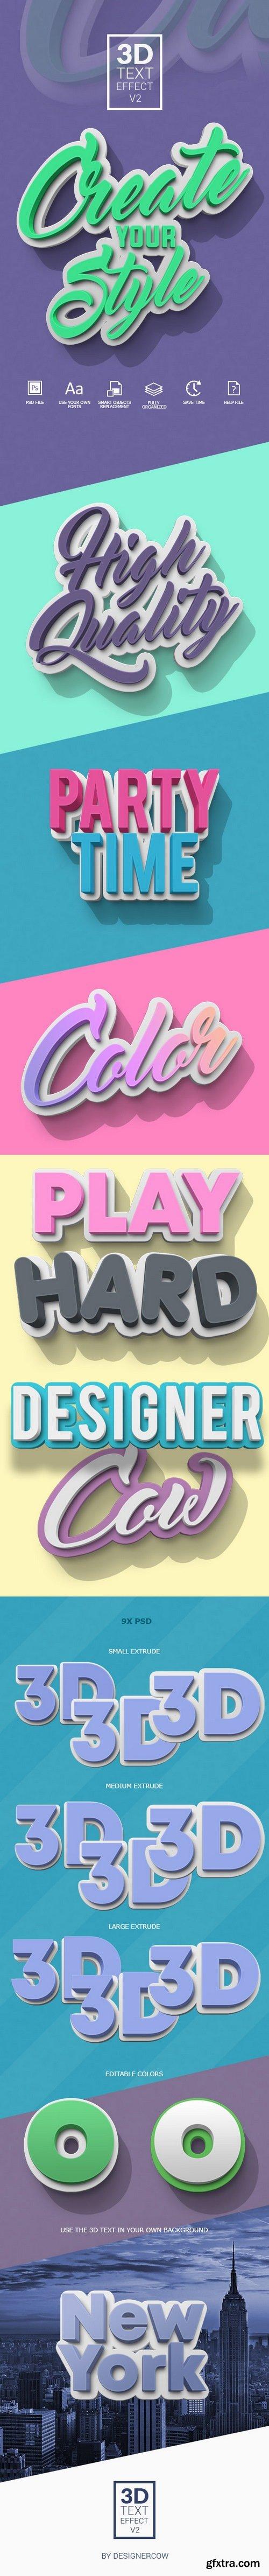 Graphicriver - 3D Text Effect V2 21584260